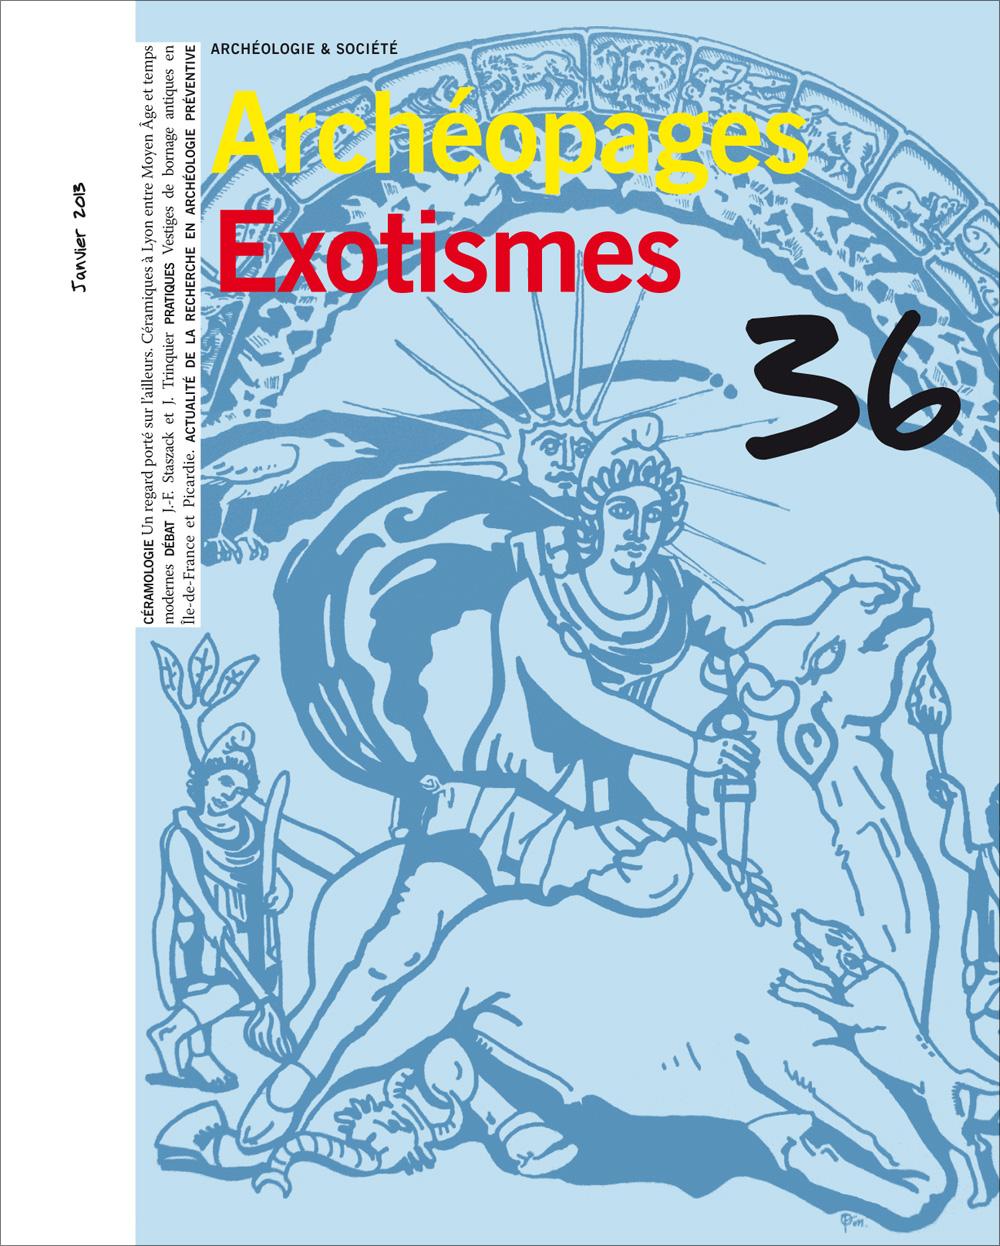 Archéopages n° 36 : <i>Exotismes</i>